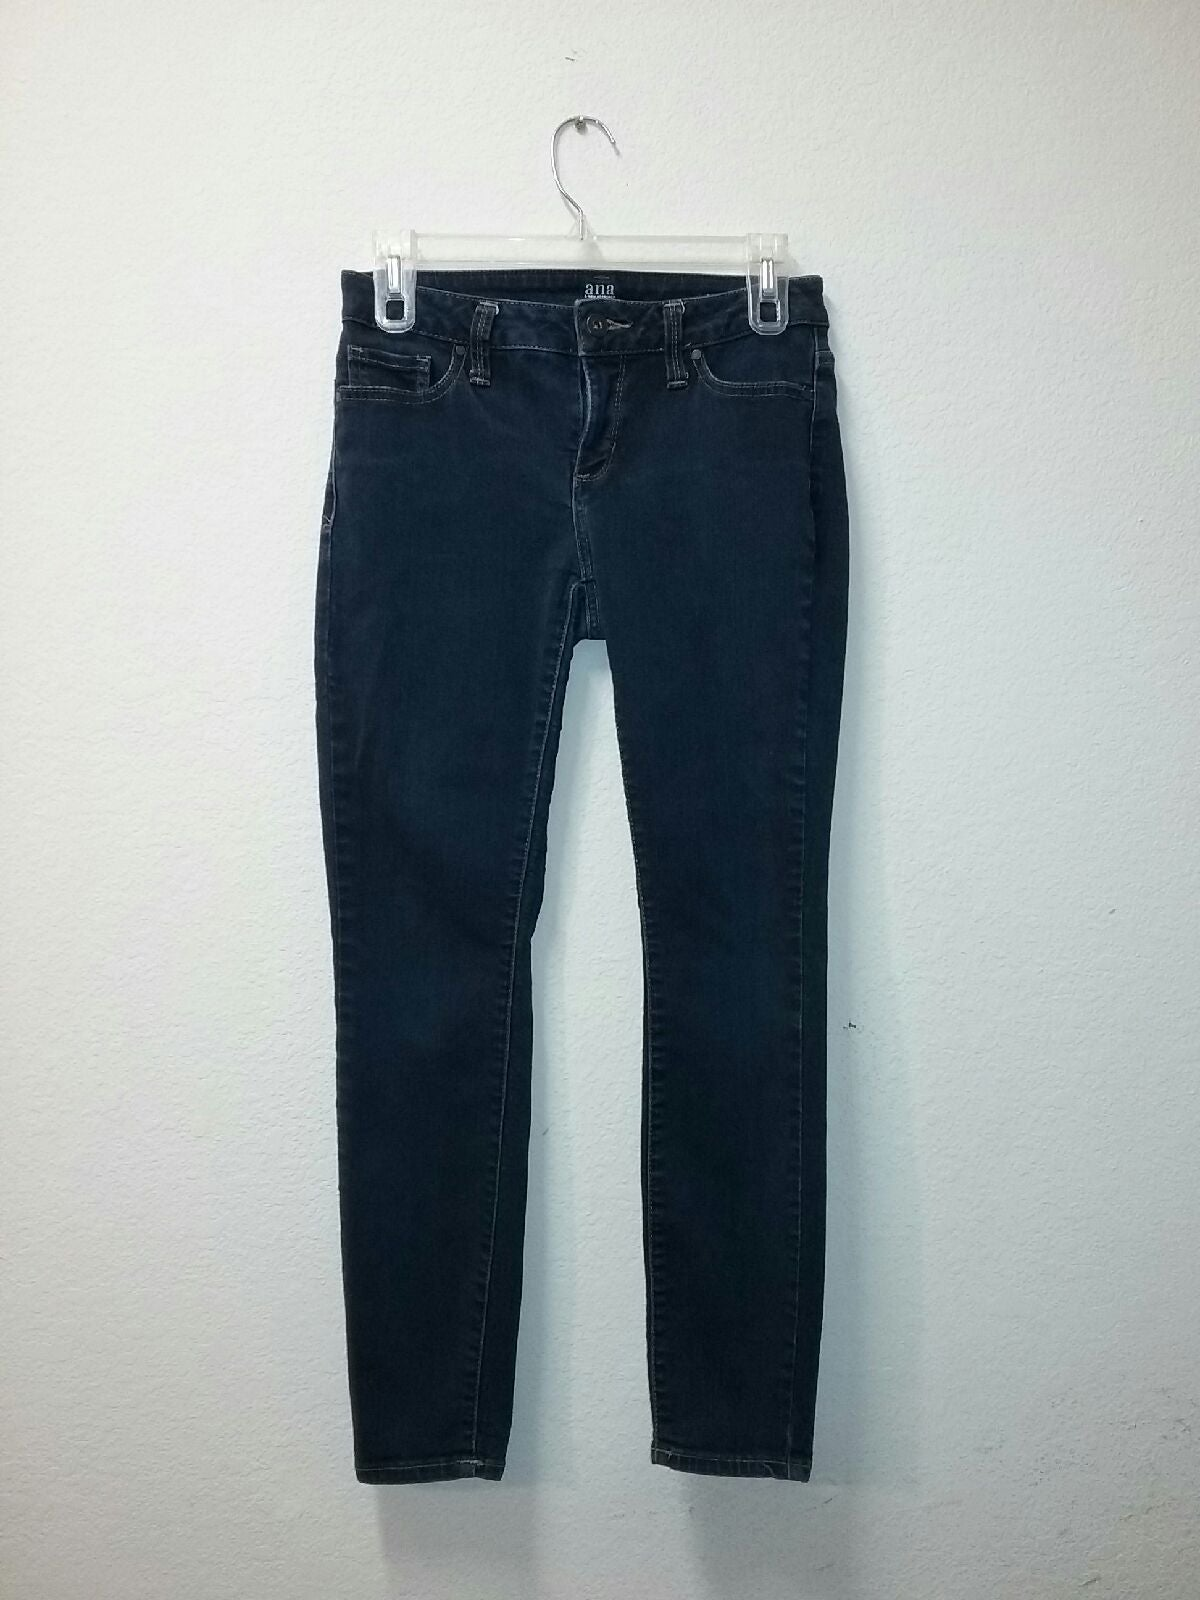 Women's  a.n.a. Jeans 4P Skinny